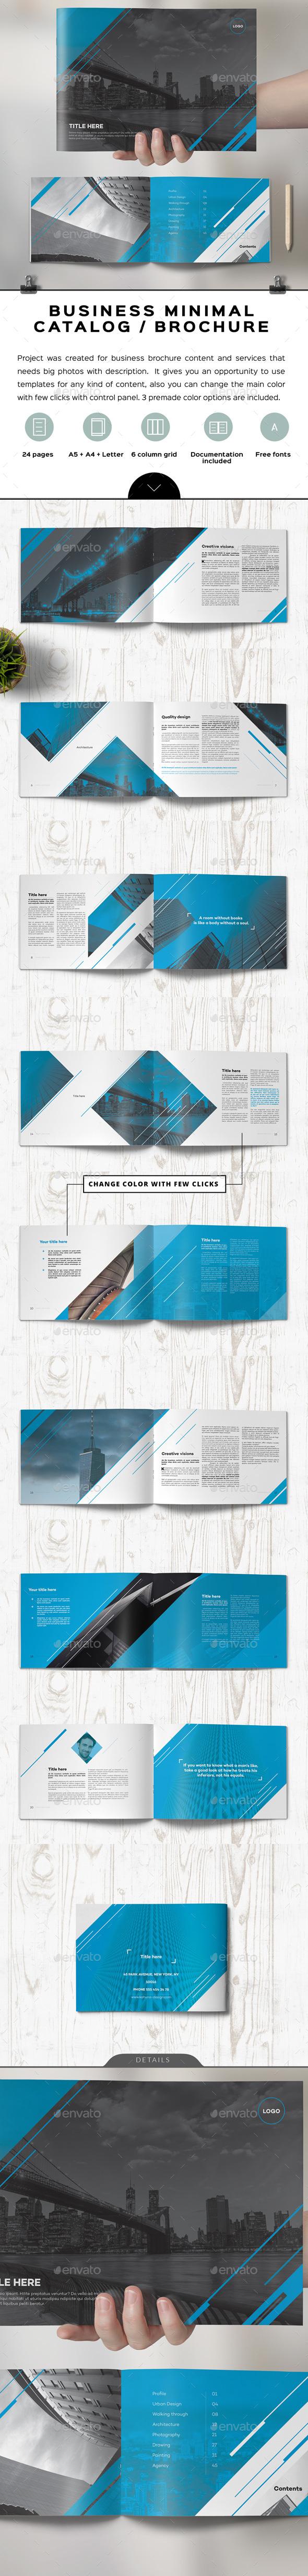 Unicado Business Minimal Brochure - Corporate Brochures